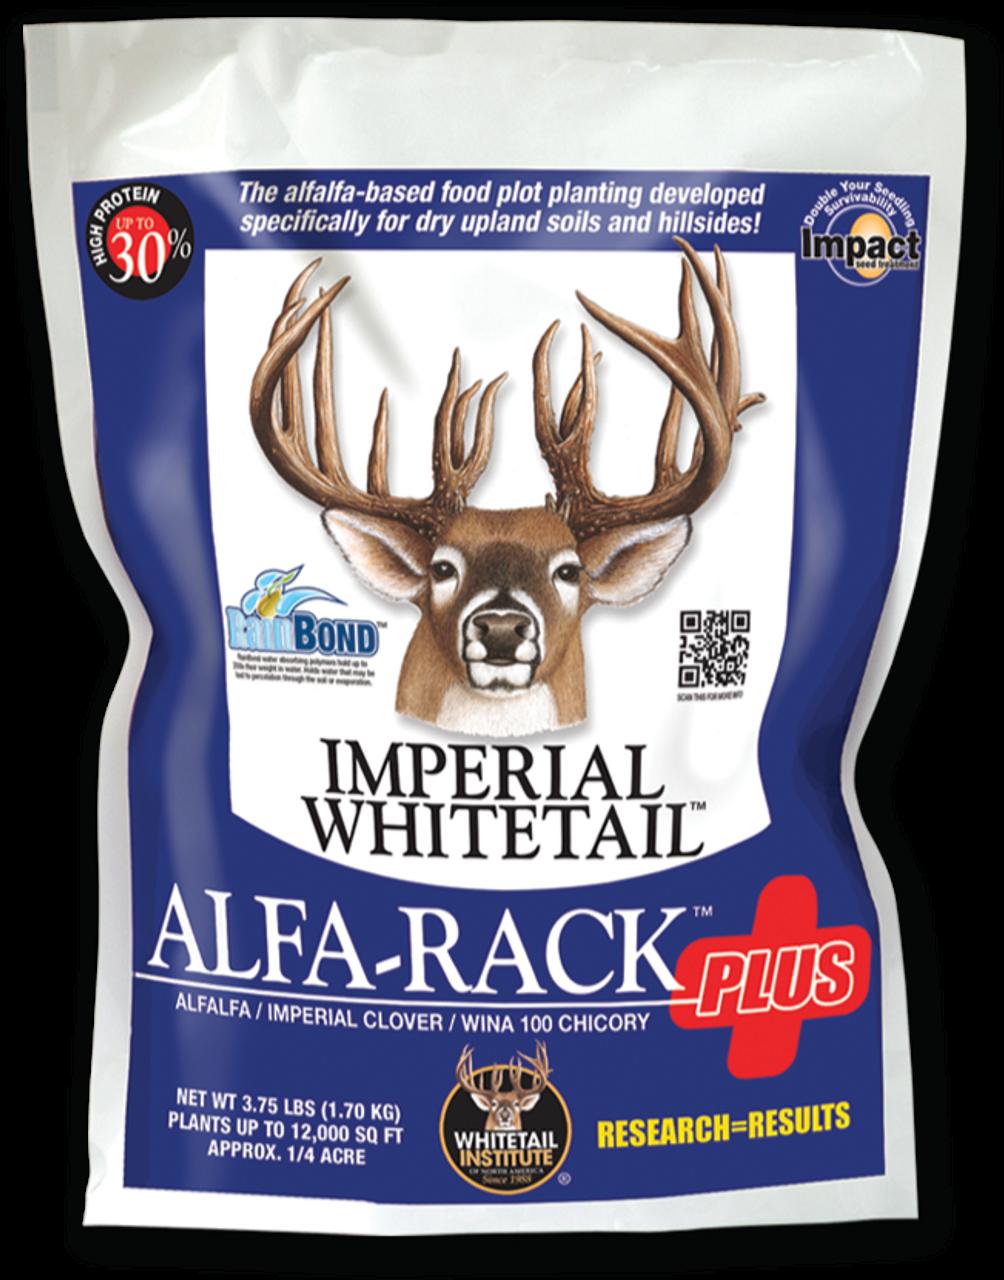 Imperial Alfa-Rack Plus (Perennial)